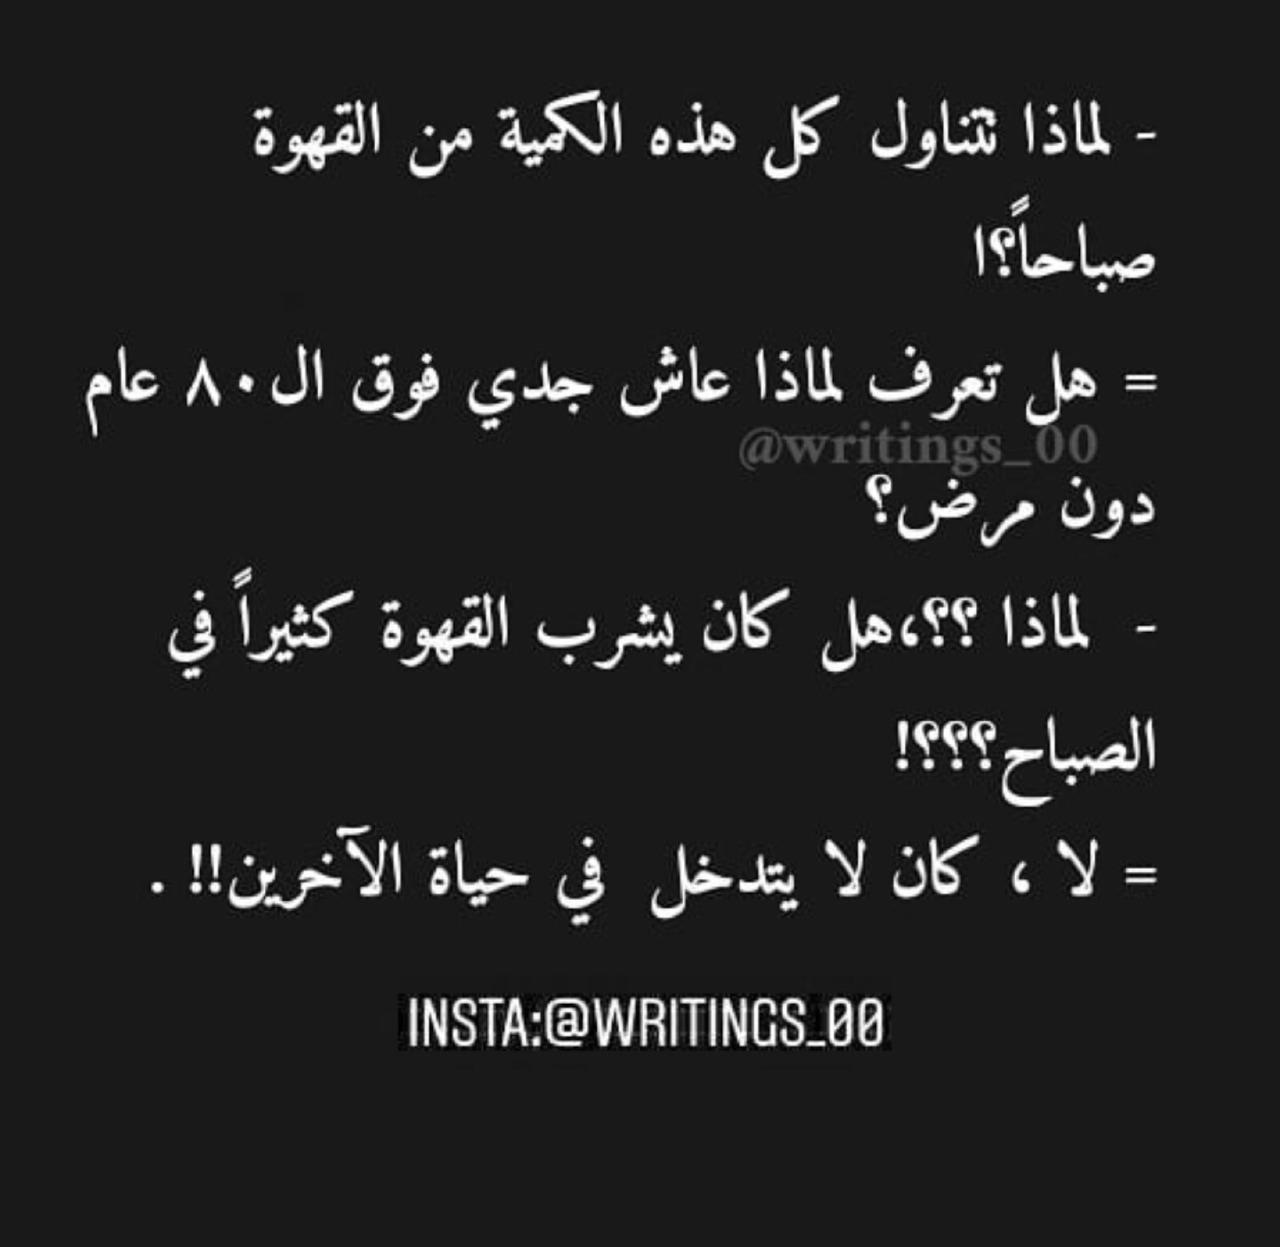 quotes, ﺍﻗﺘﺒﺎﺳﺎﺕ, and كتابات image